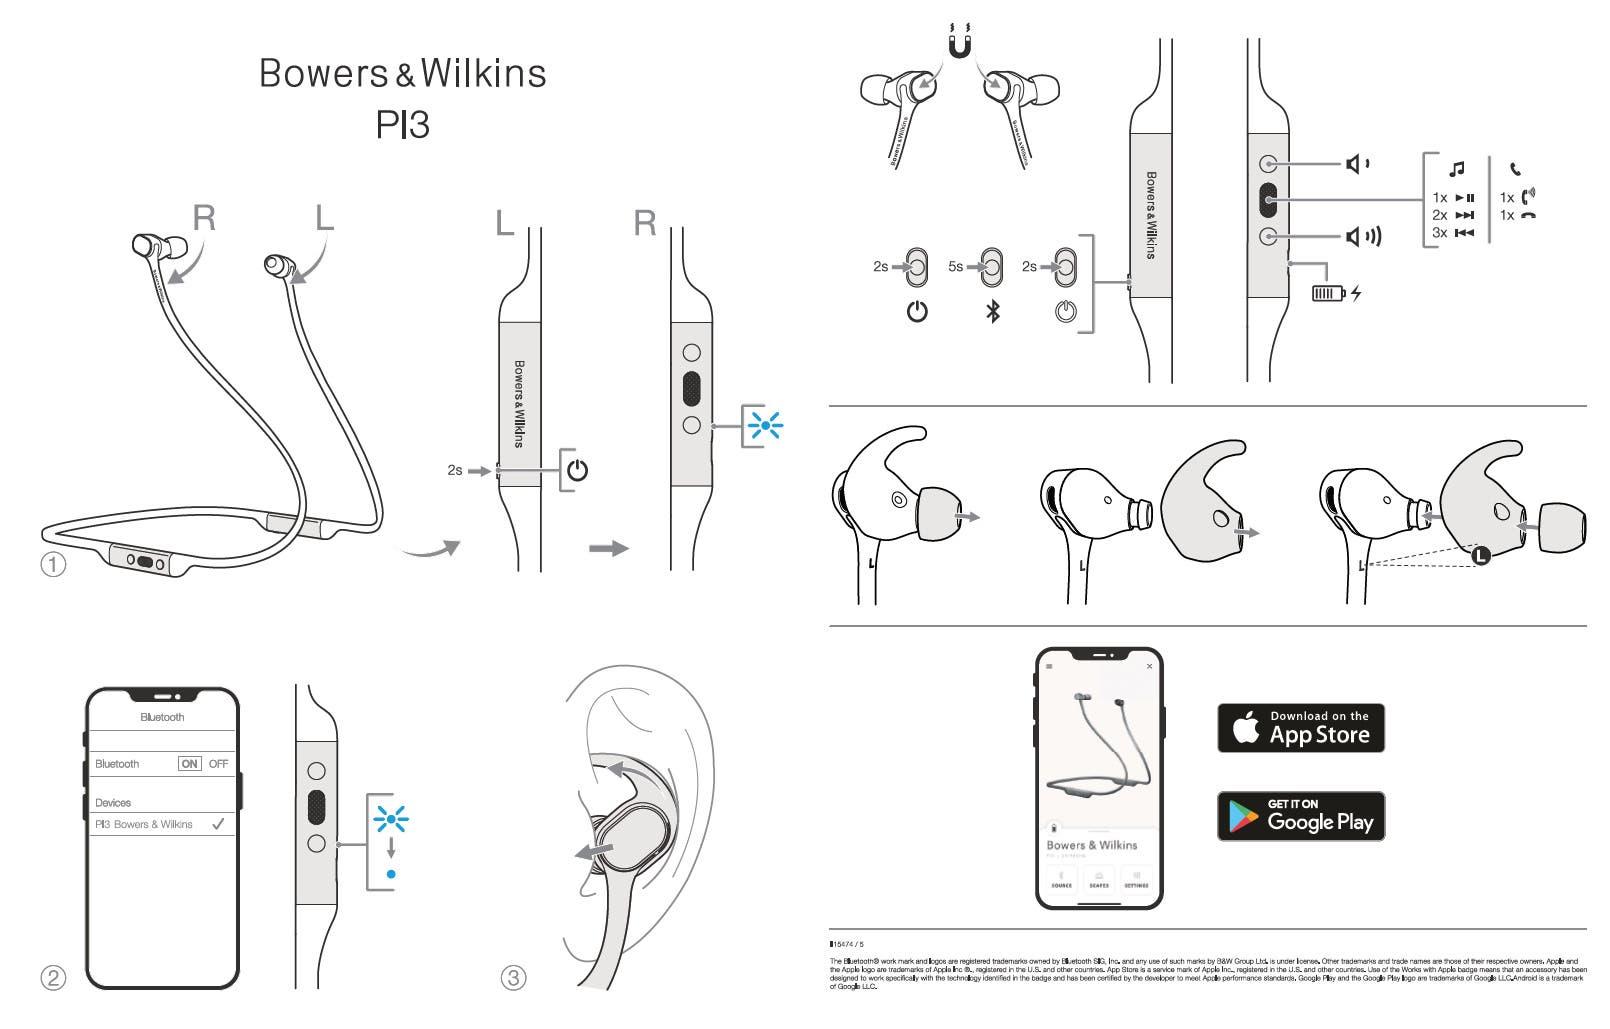 Bowers & Wilkins PI3 Schnellstart-Anleitung